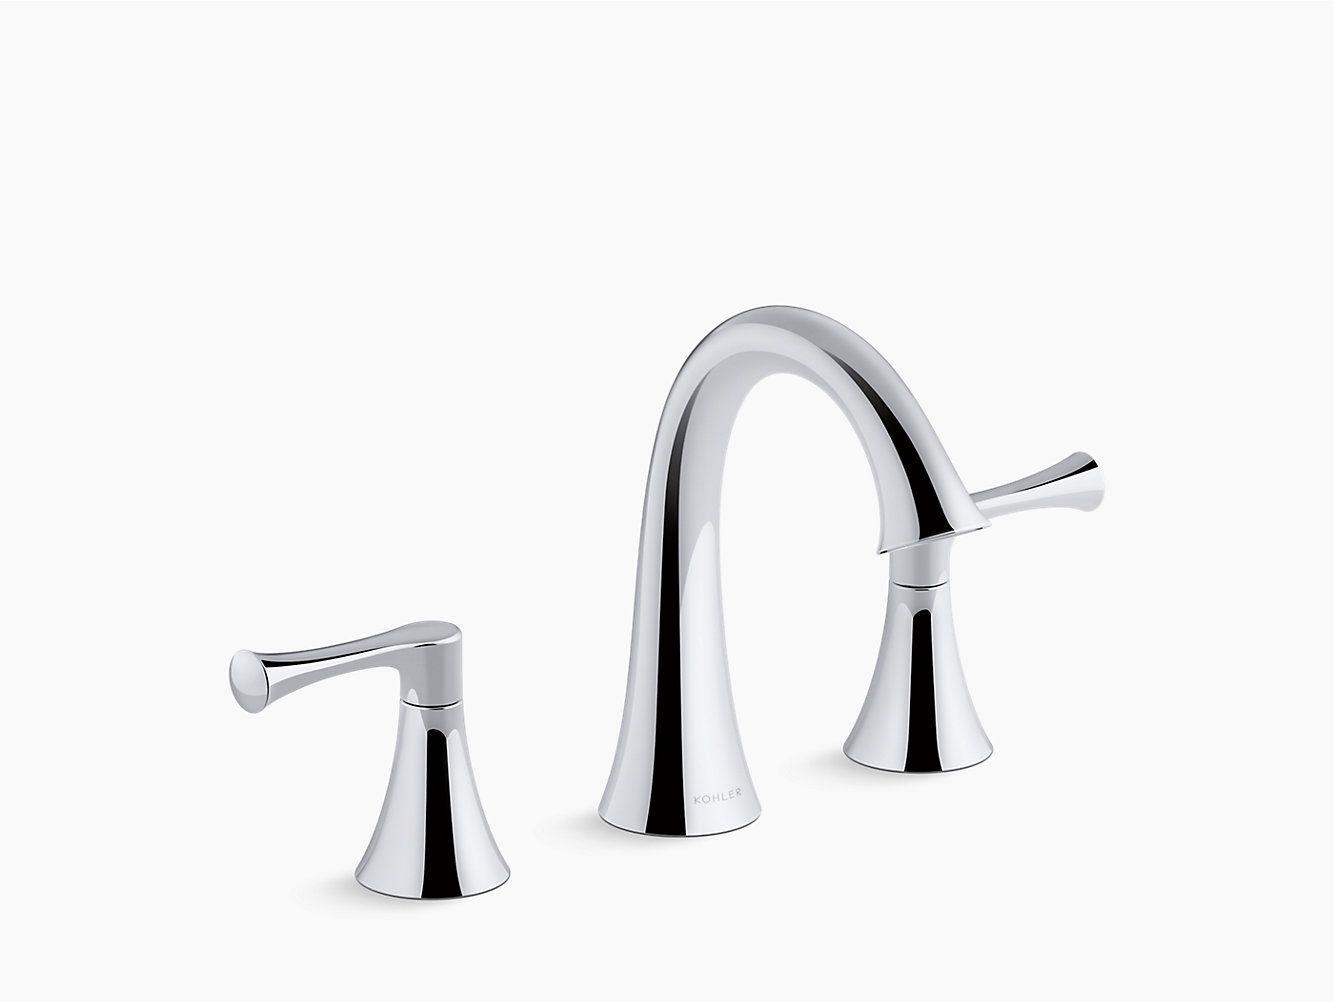 K R78047 4d Lilyfield Widespread Bathroom Sink Faucet Kohler